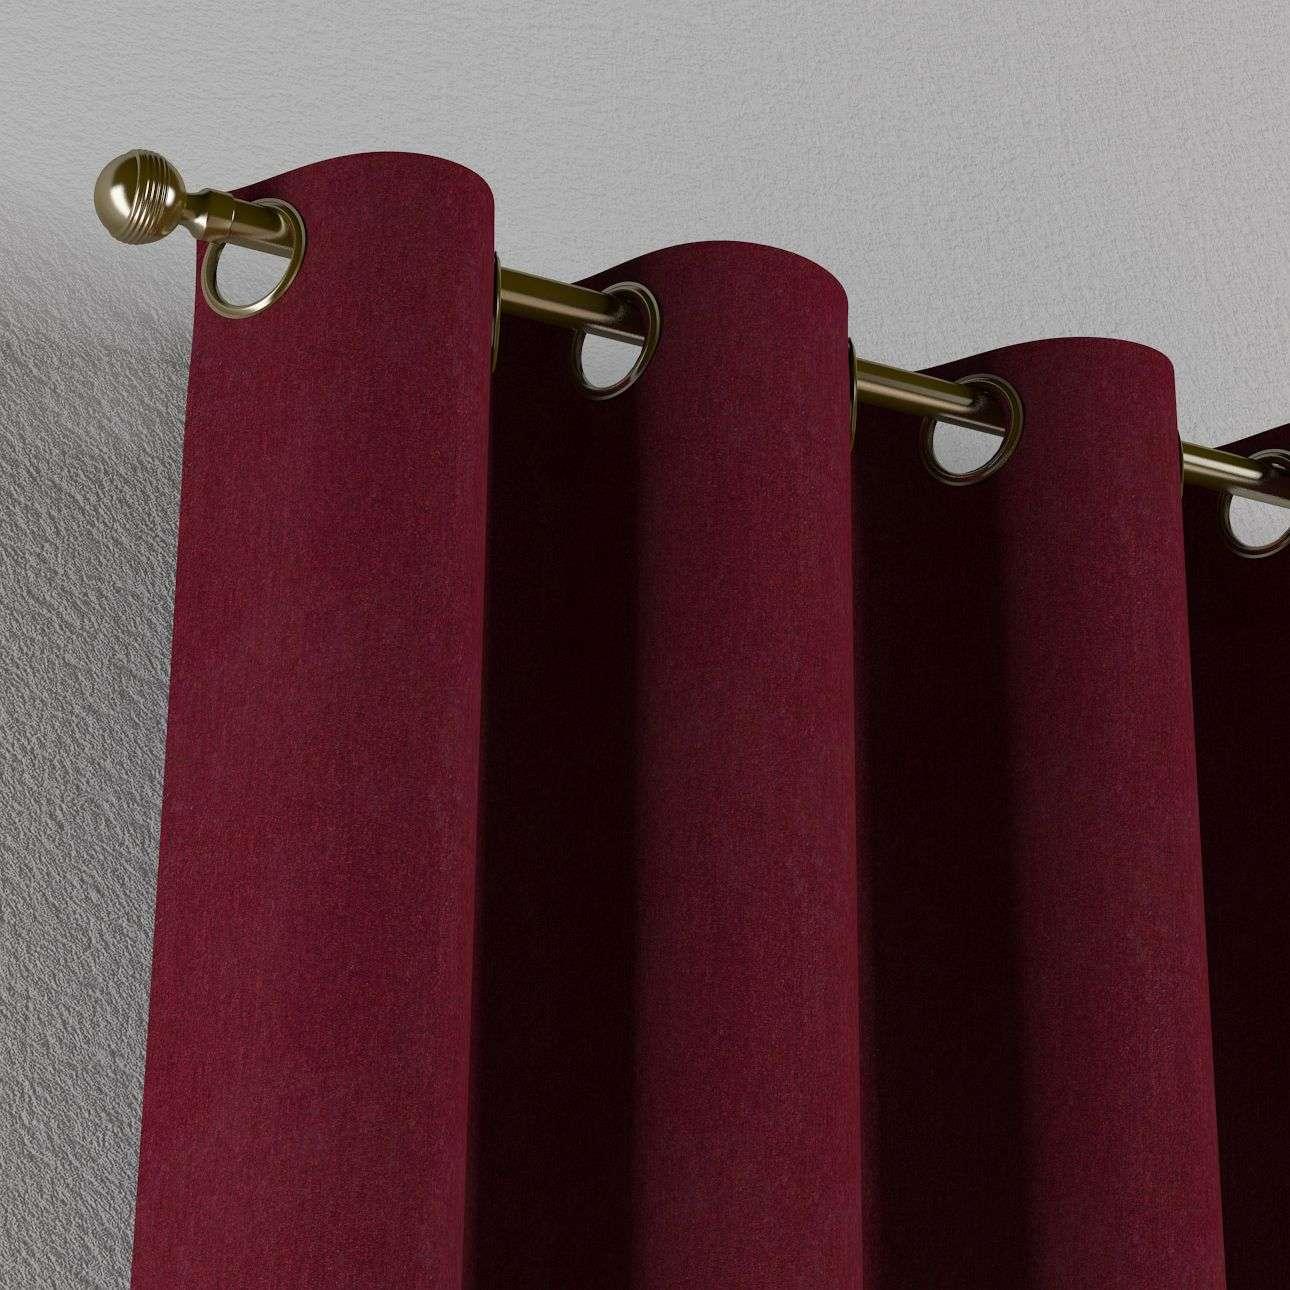 Záves s kolieskami 130 x 260 cm V kolekcii Chenille, tkanina: 702-19